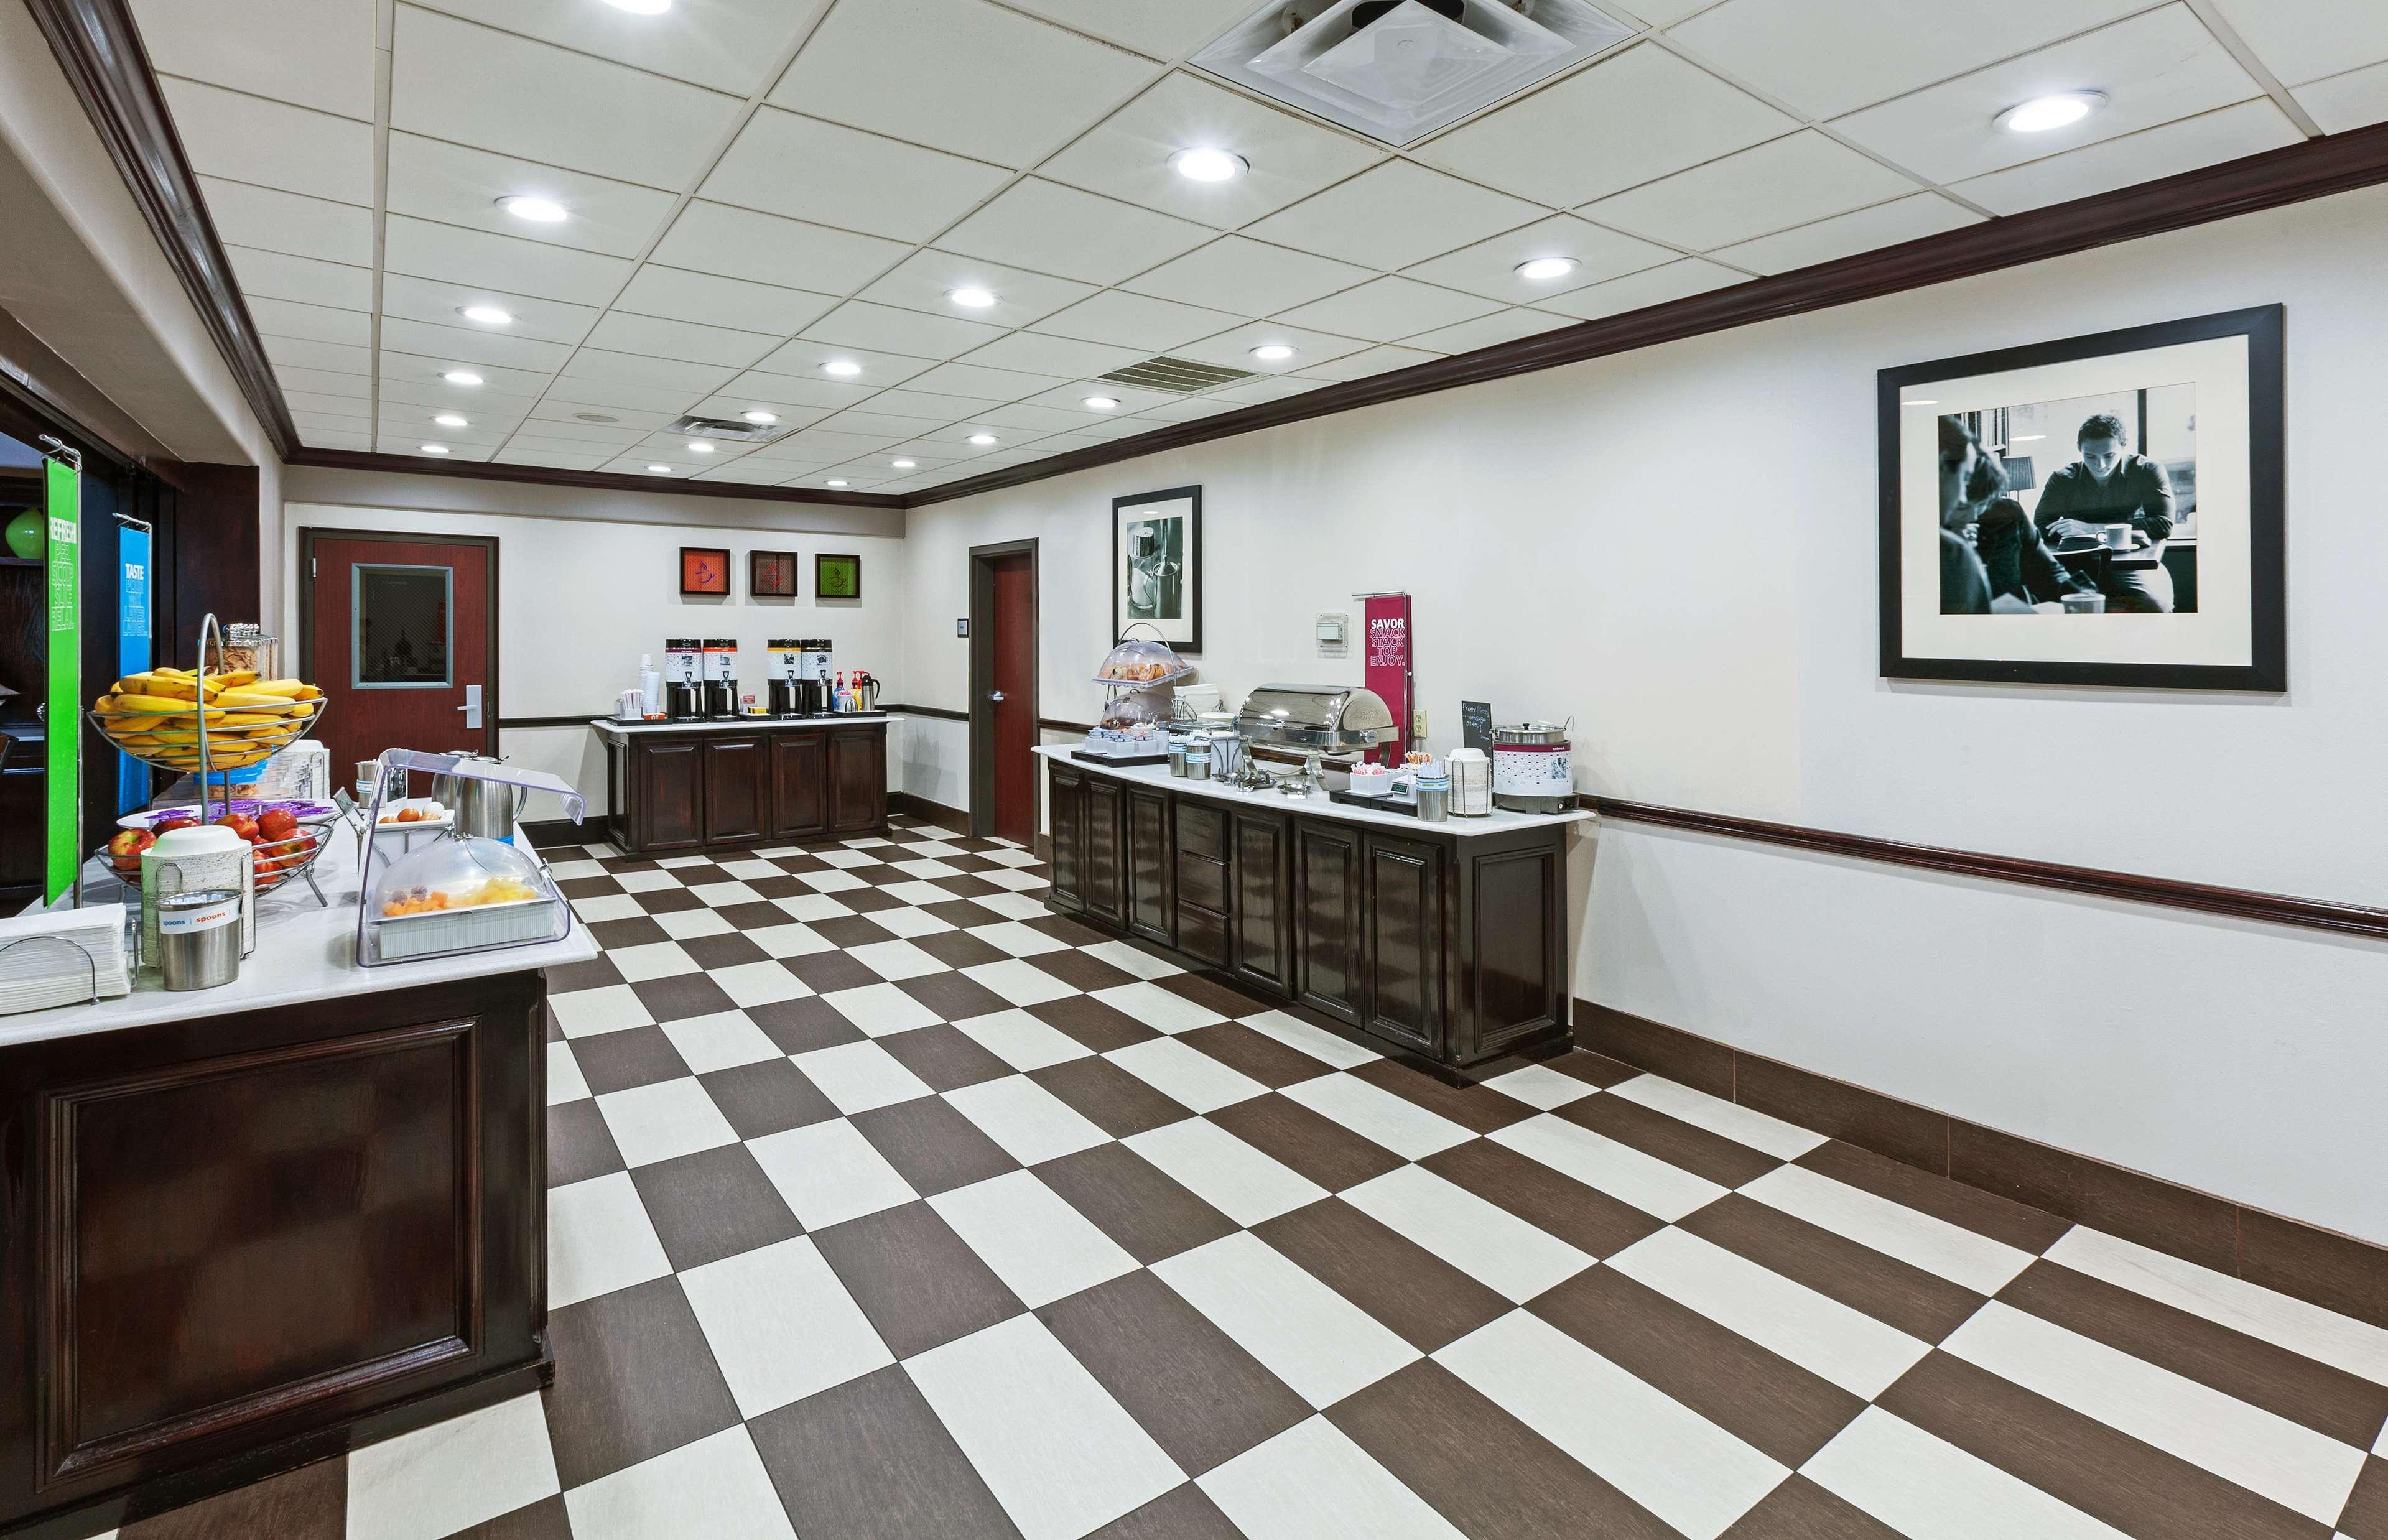 Hampton Inn & Suites Galveston image 11